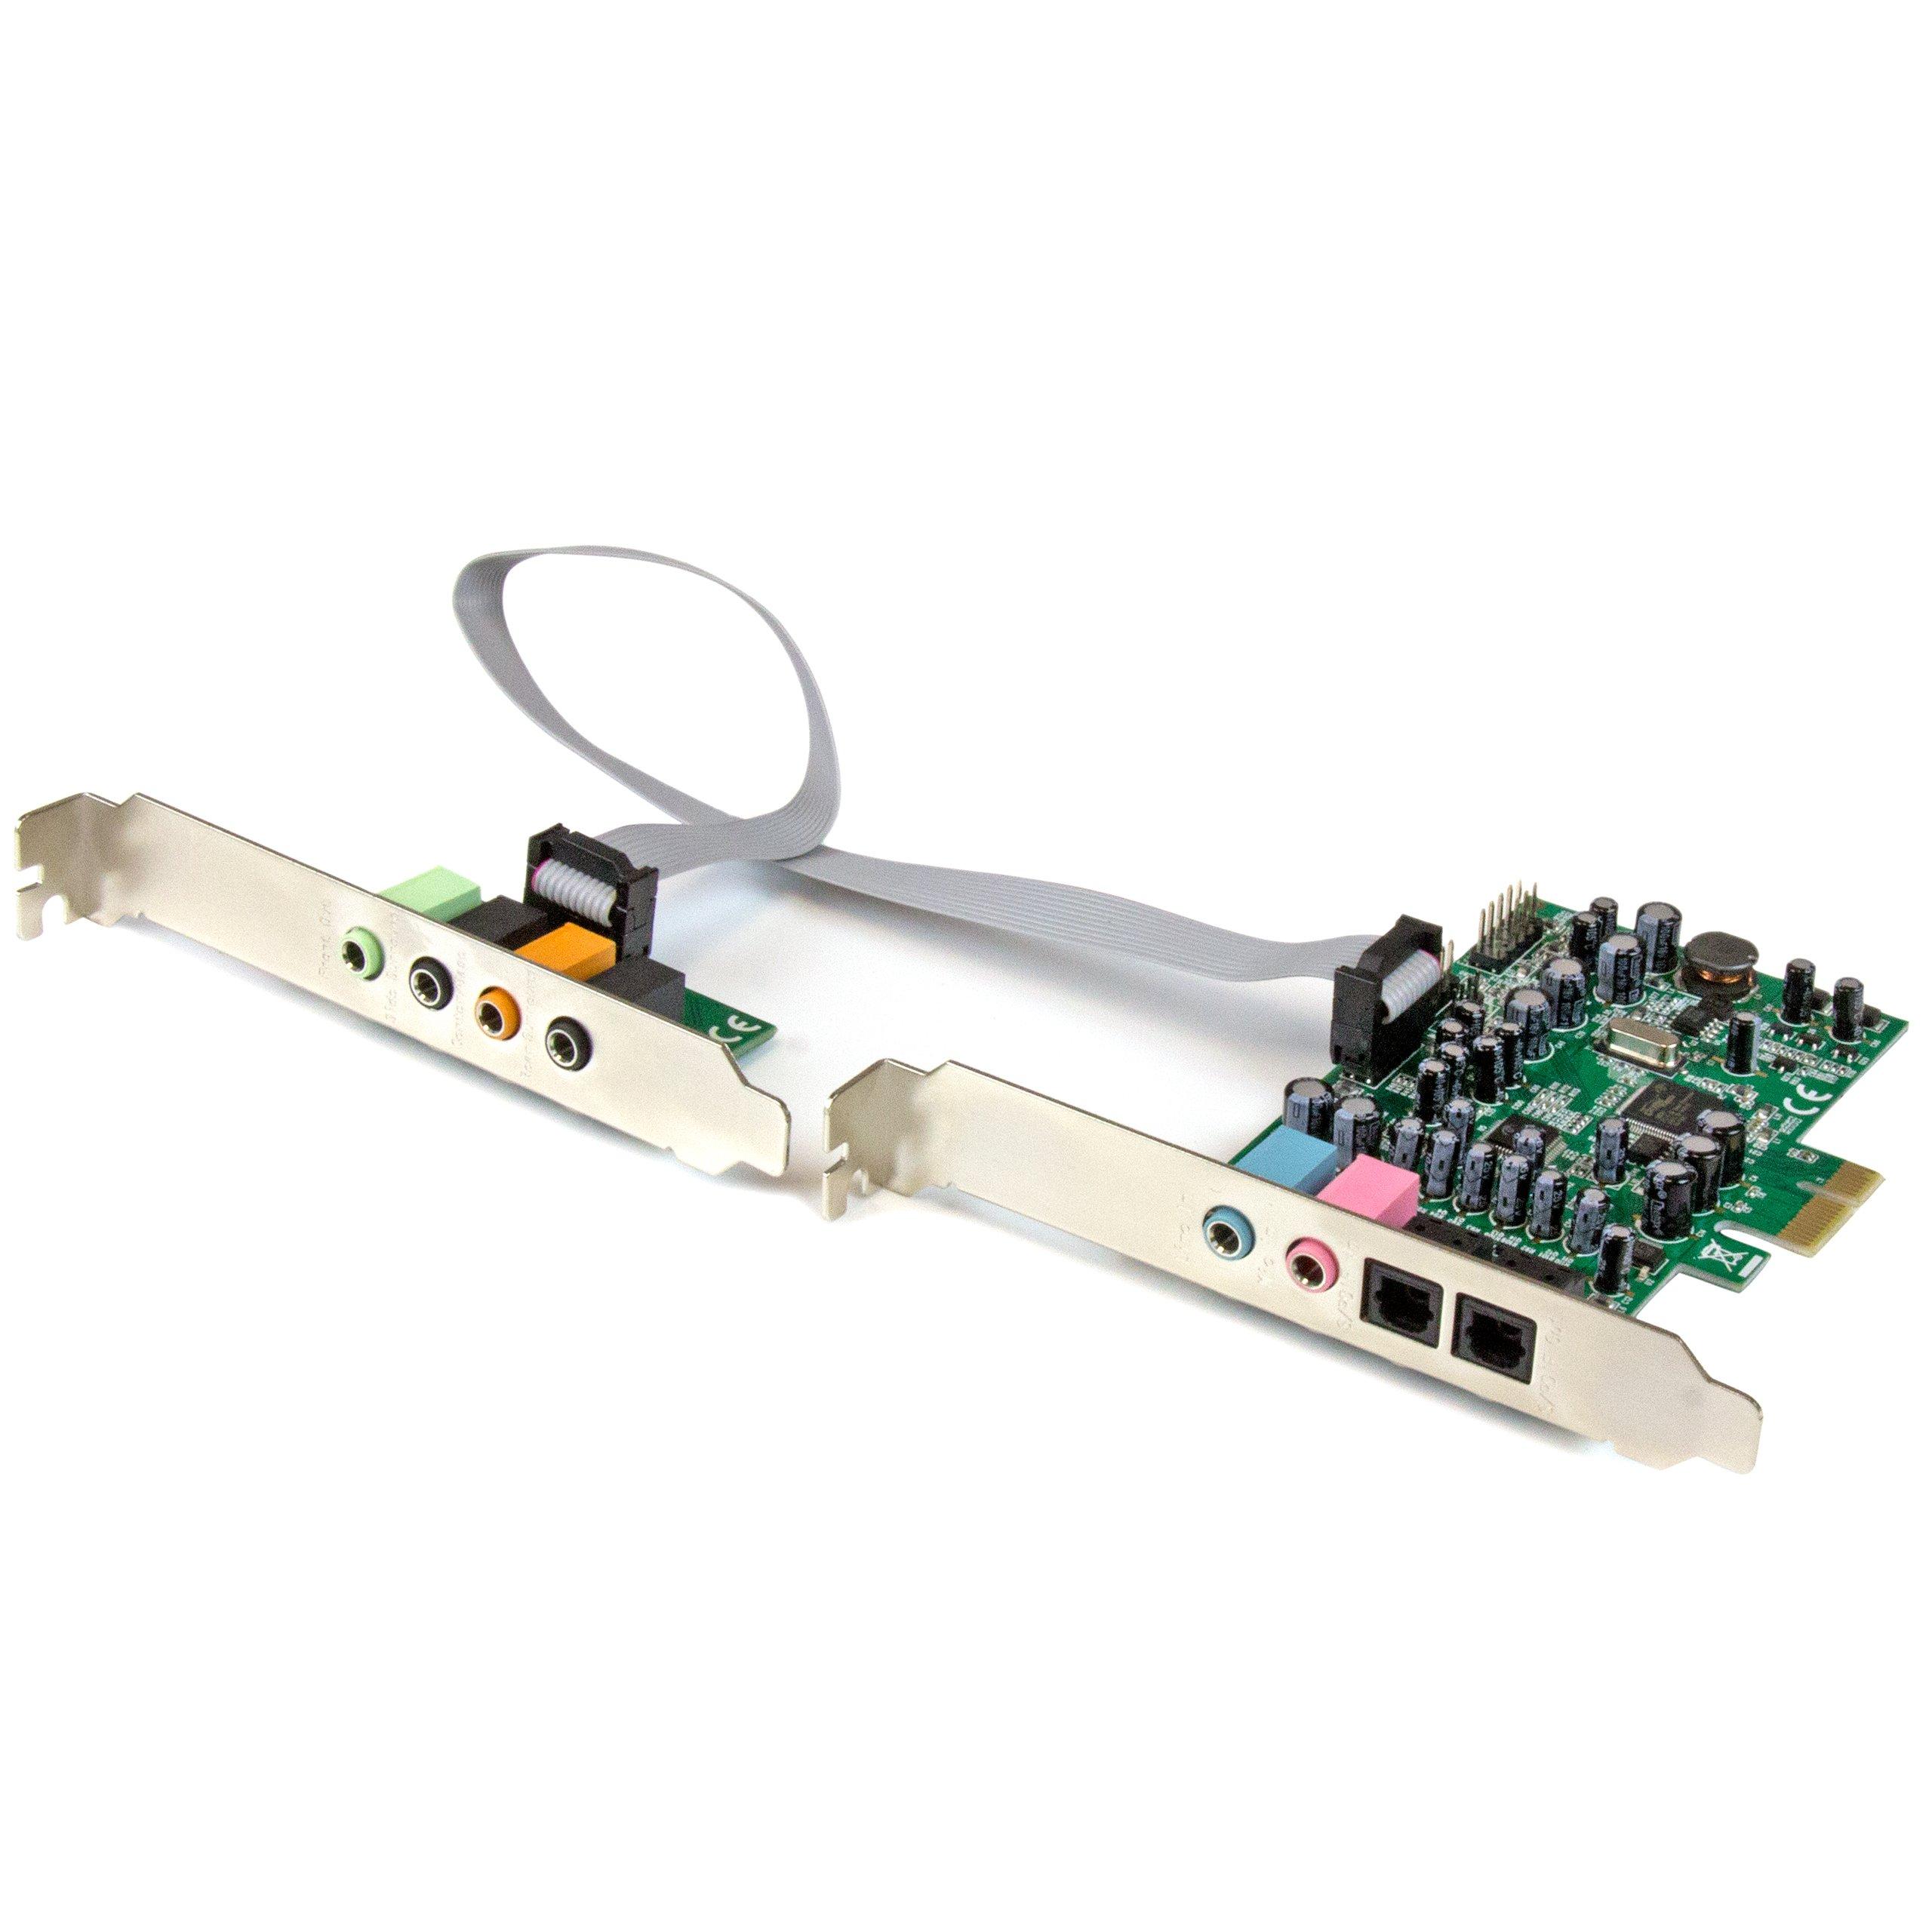 StarTech.com 7.1 Channel Sound Card - PCI Express - 24-bit - 192KHz - SPDIF Digital Optical and 3.5mm Analog Audio (PEXSOUND7CH) by StarTech